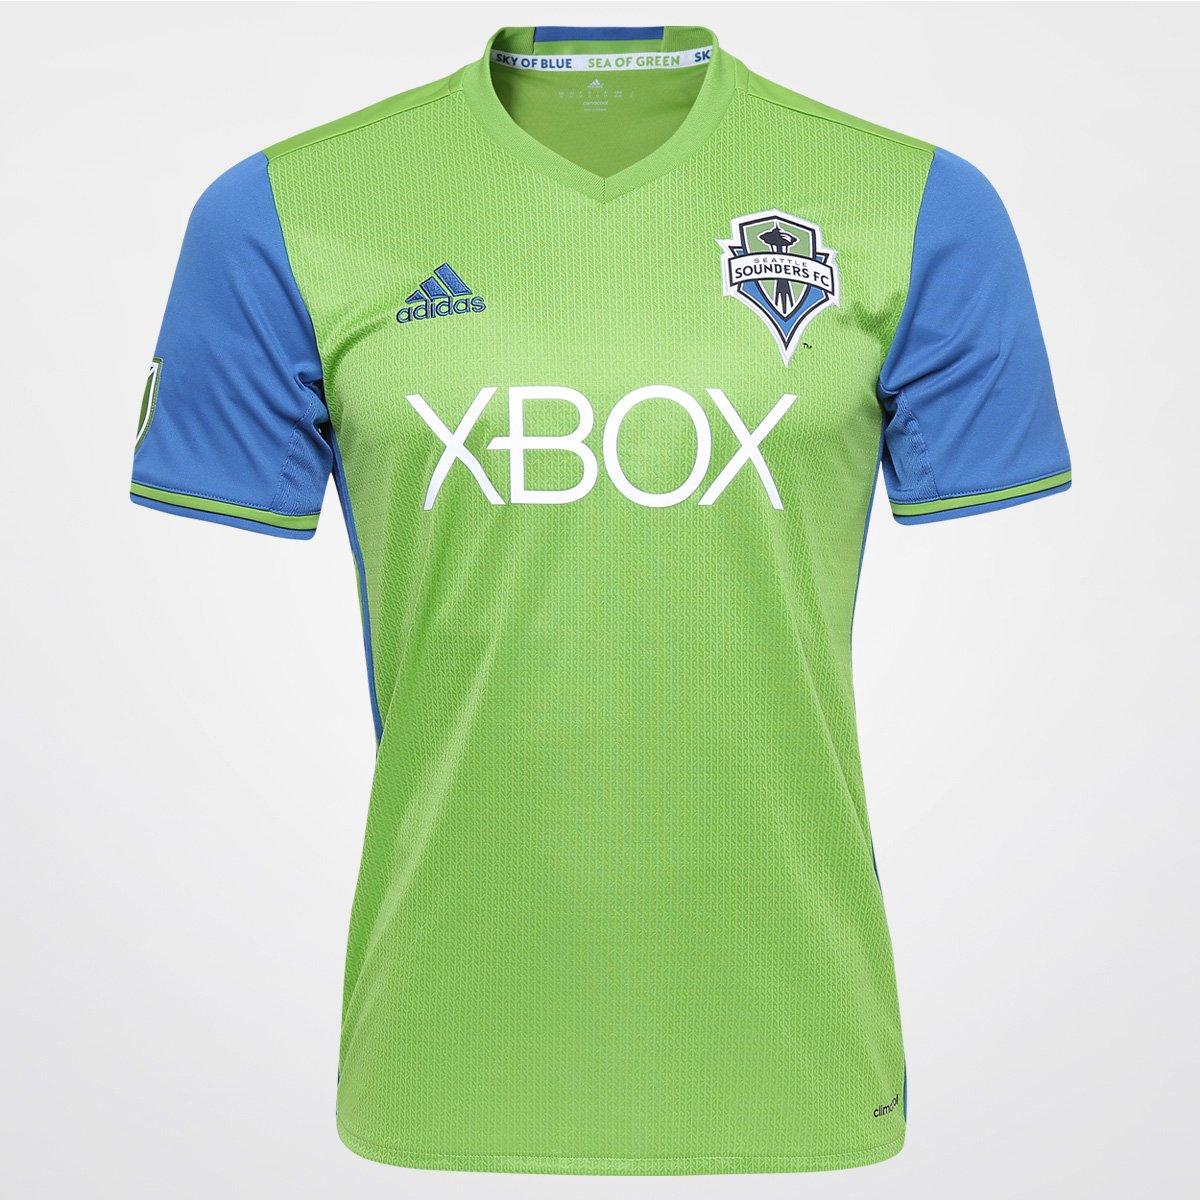 88591471e8 Camisa Adidas MLS Seattle Sounders Home 2016 s nº - Compre Agora ...